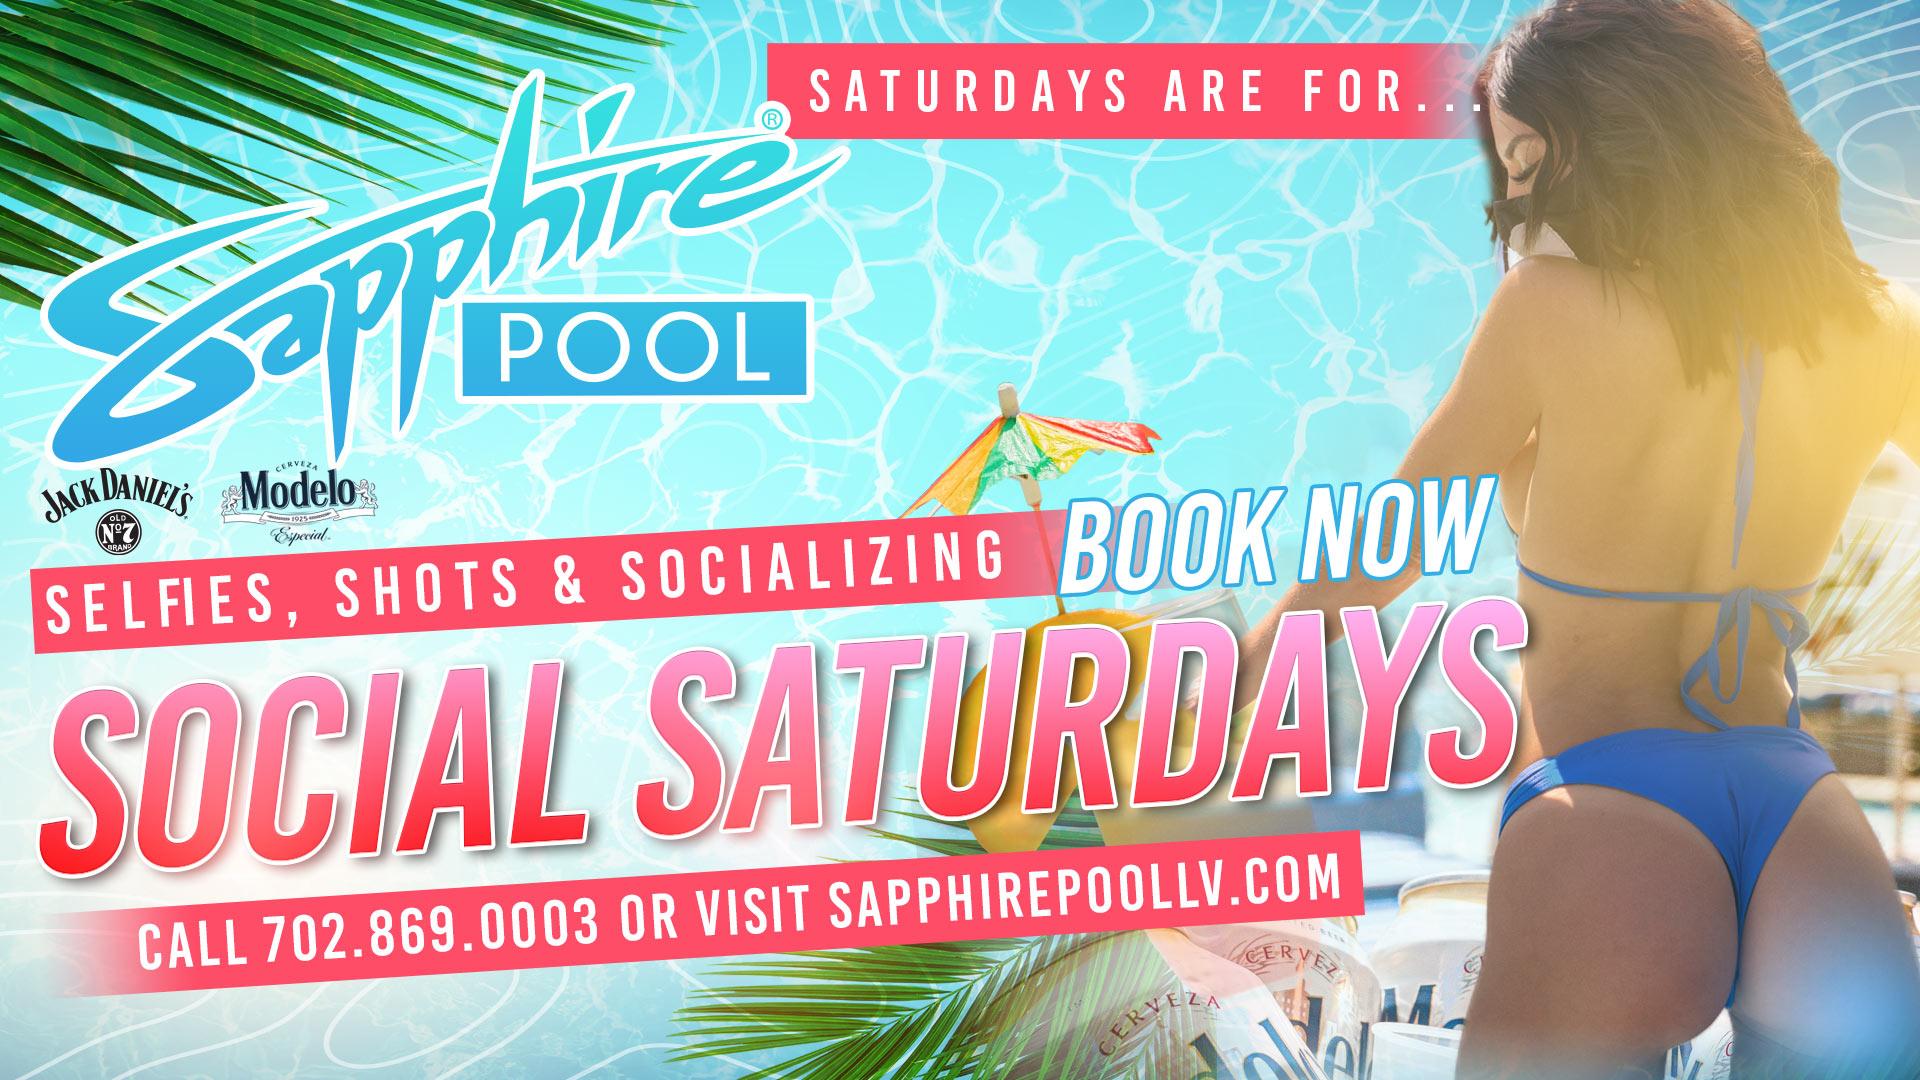 Social Saturdays Poolside in LV